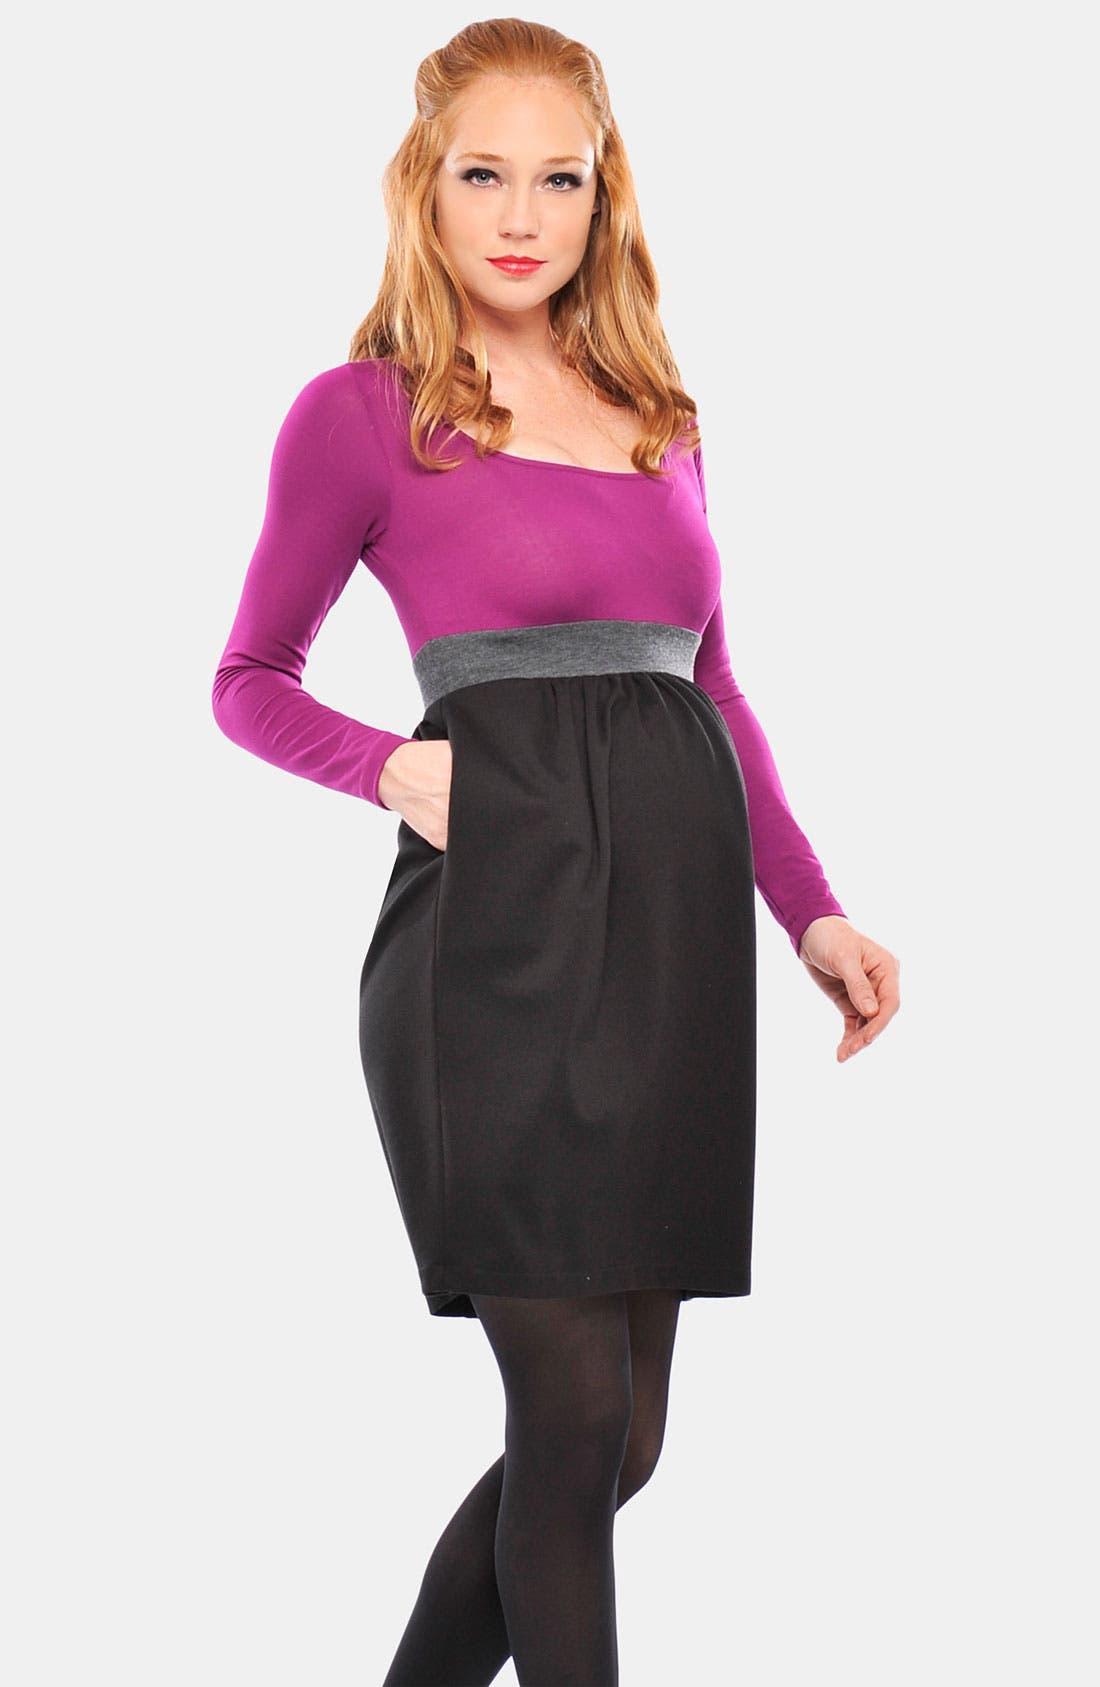 Alternate Image 1 Selected - Olian 'Kate' Straight Leg Woven Maternity Pants